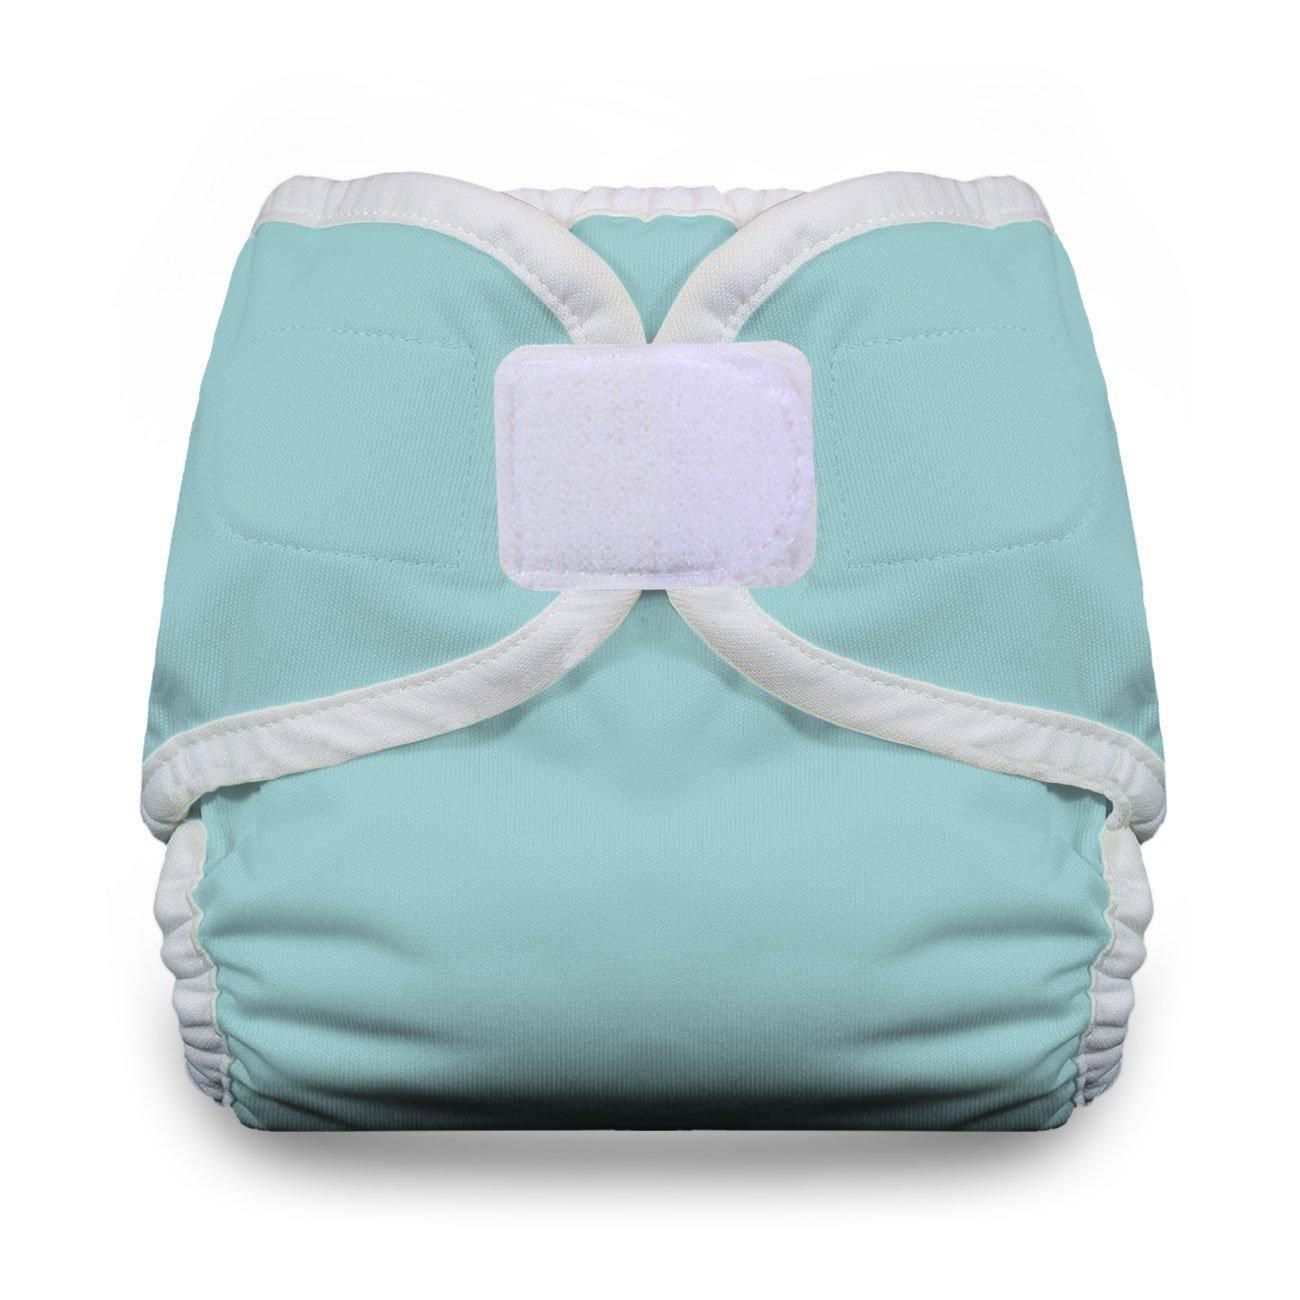 Thirsties Hook and Loop Diaper Cover, White, Newborn/Preemie TDCHLW0